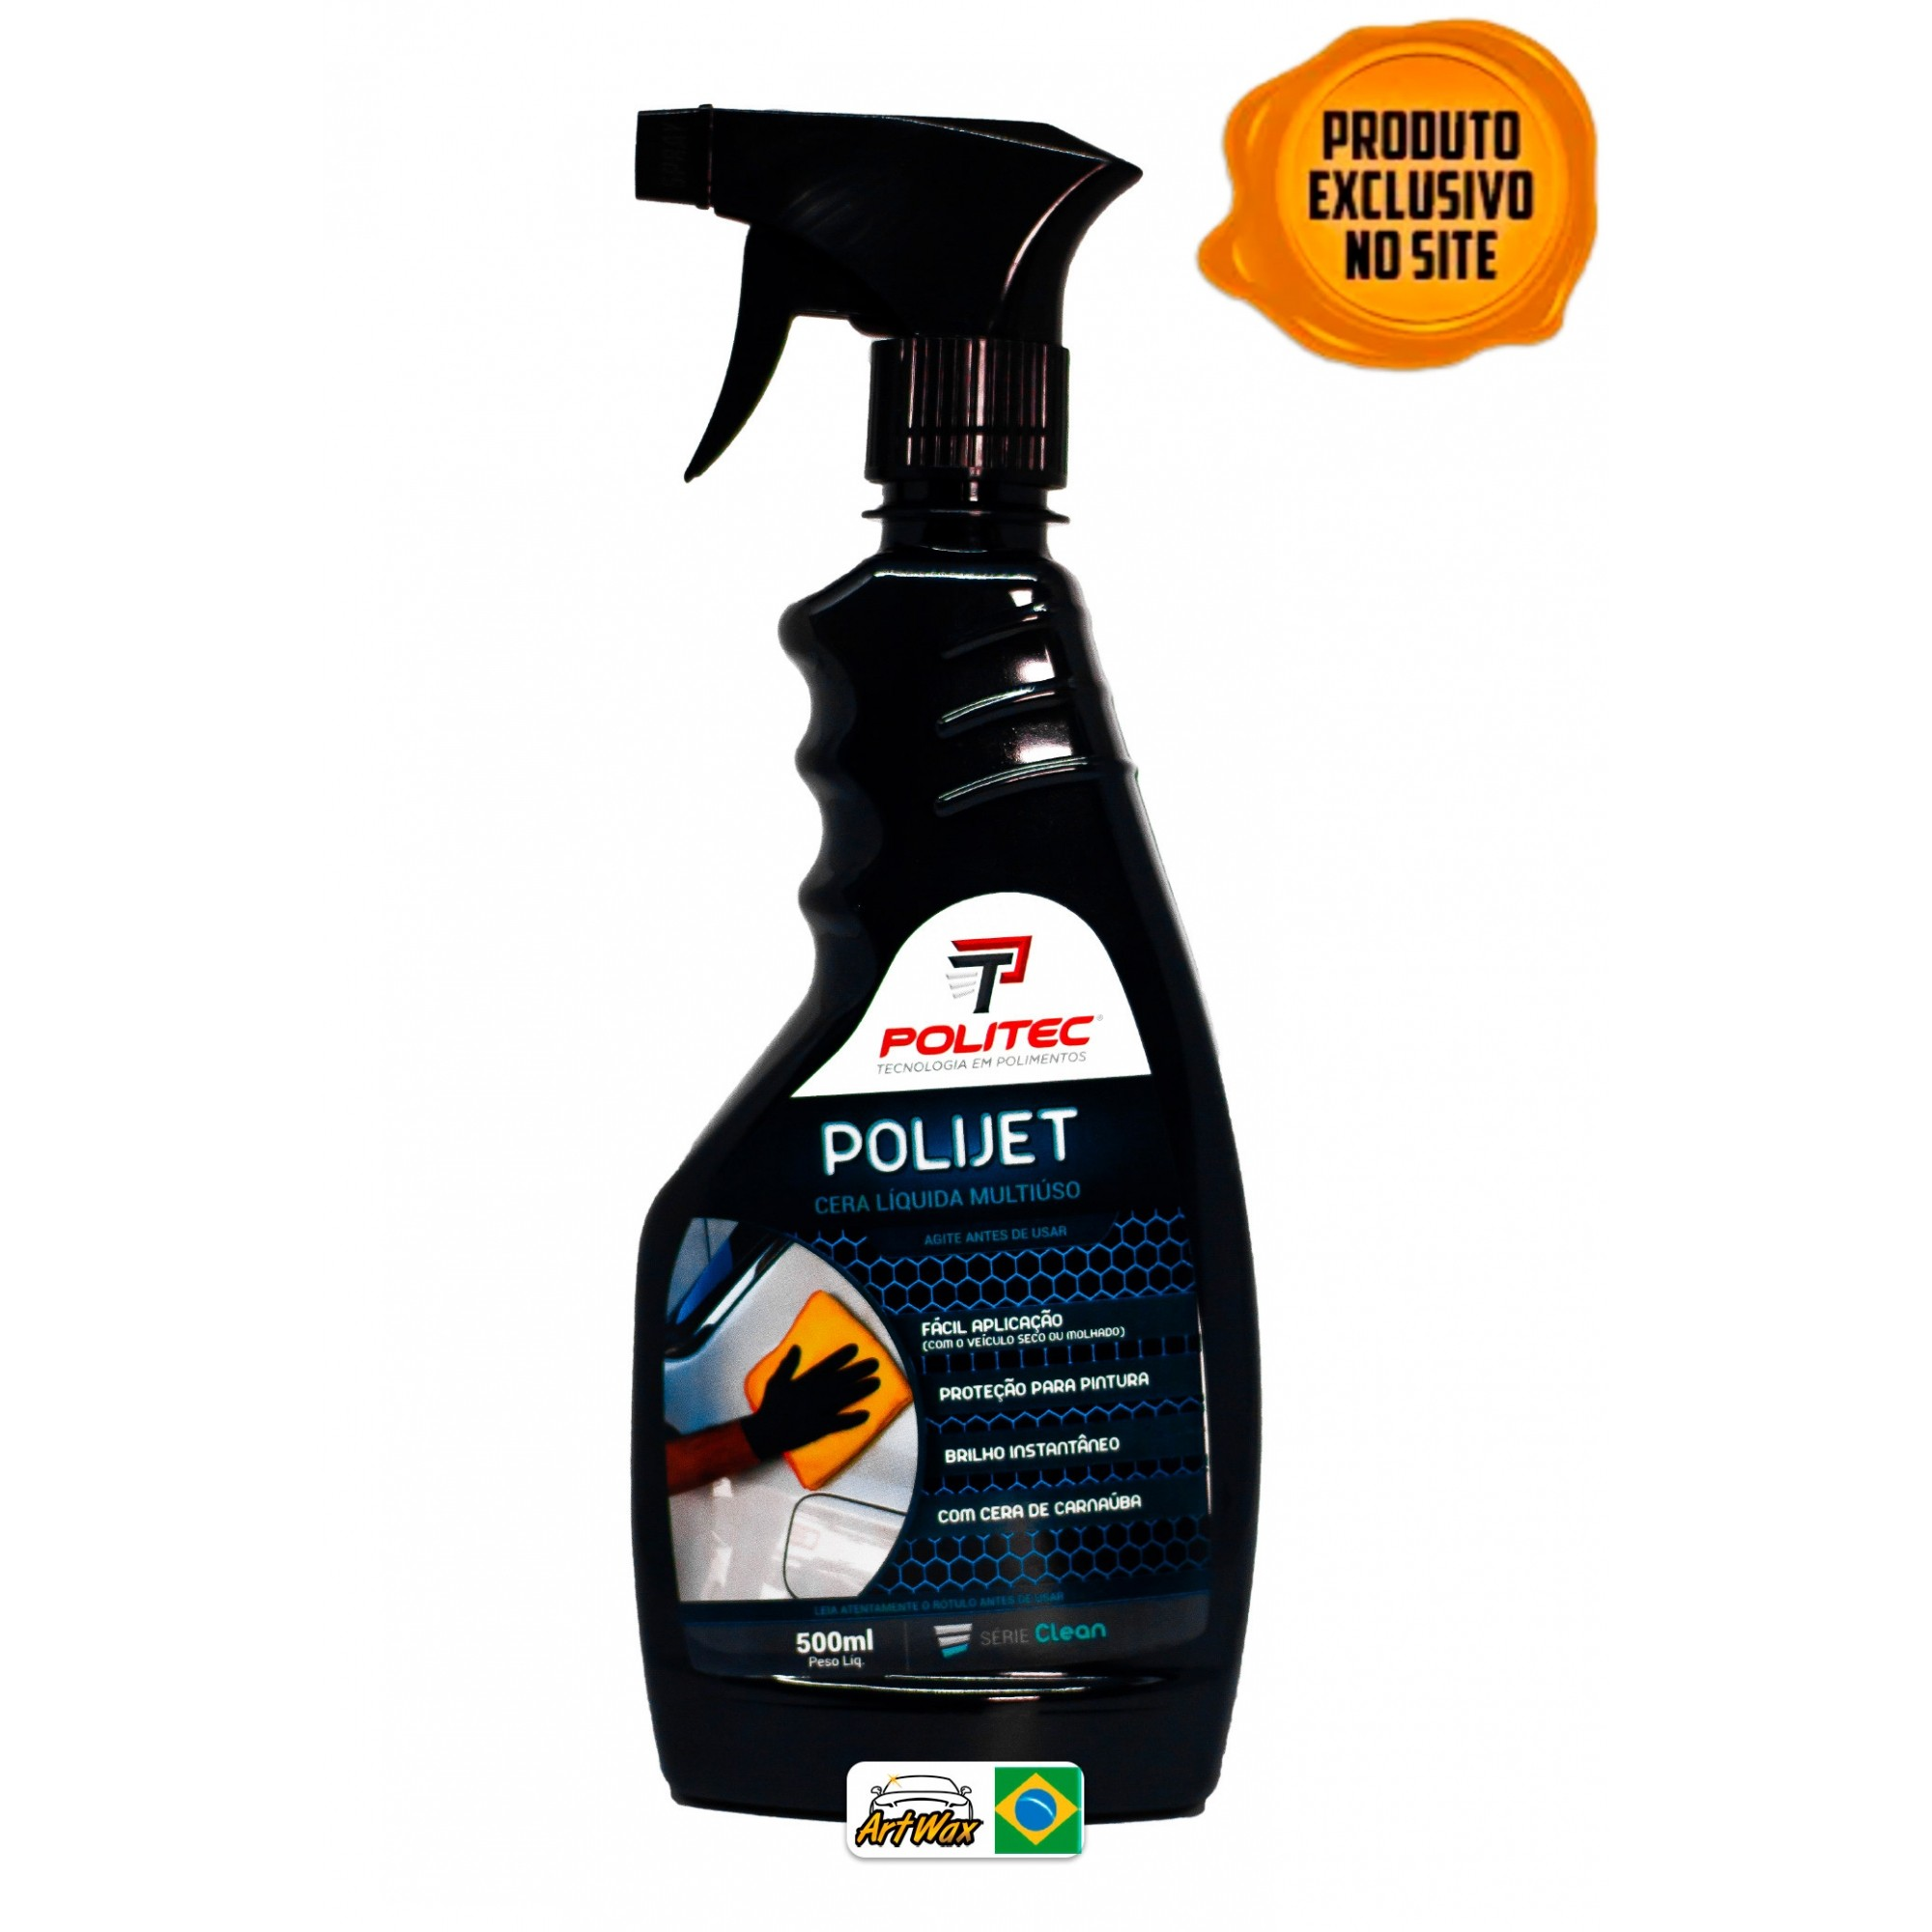 Polijet 500ml - Cera Protetora Liquida Multiuso Politec